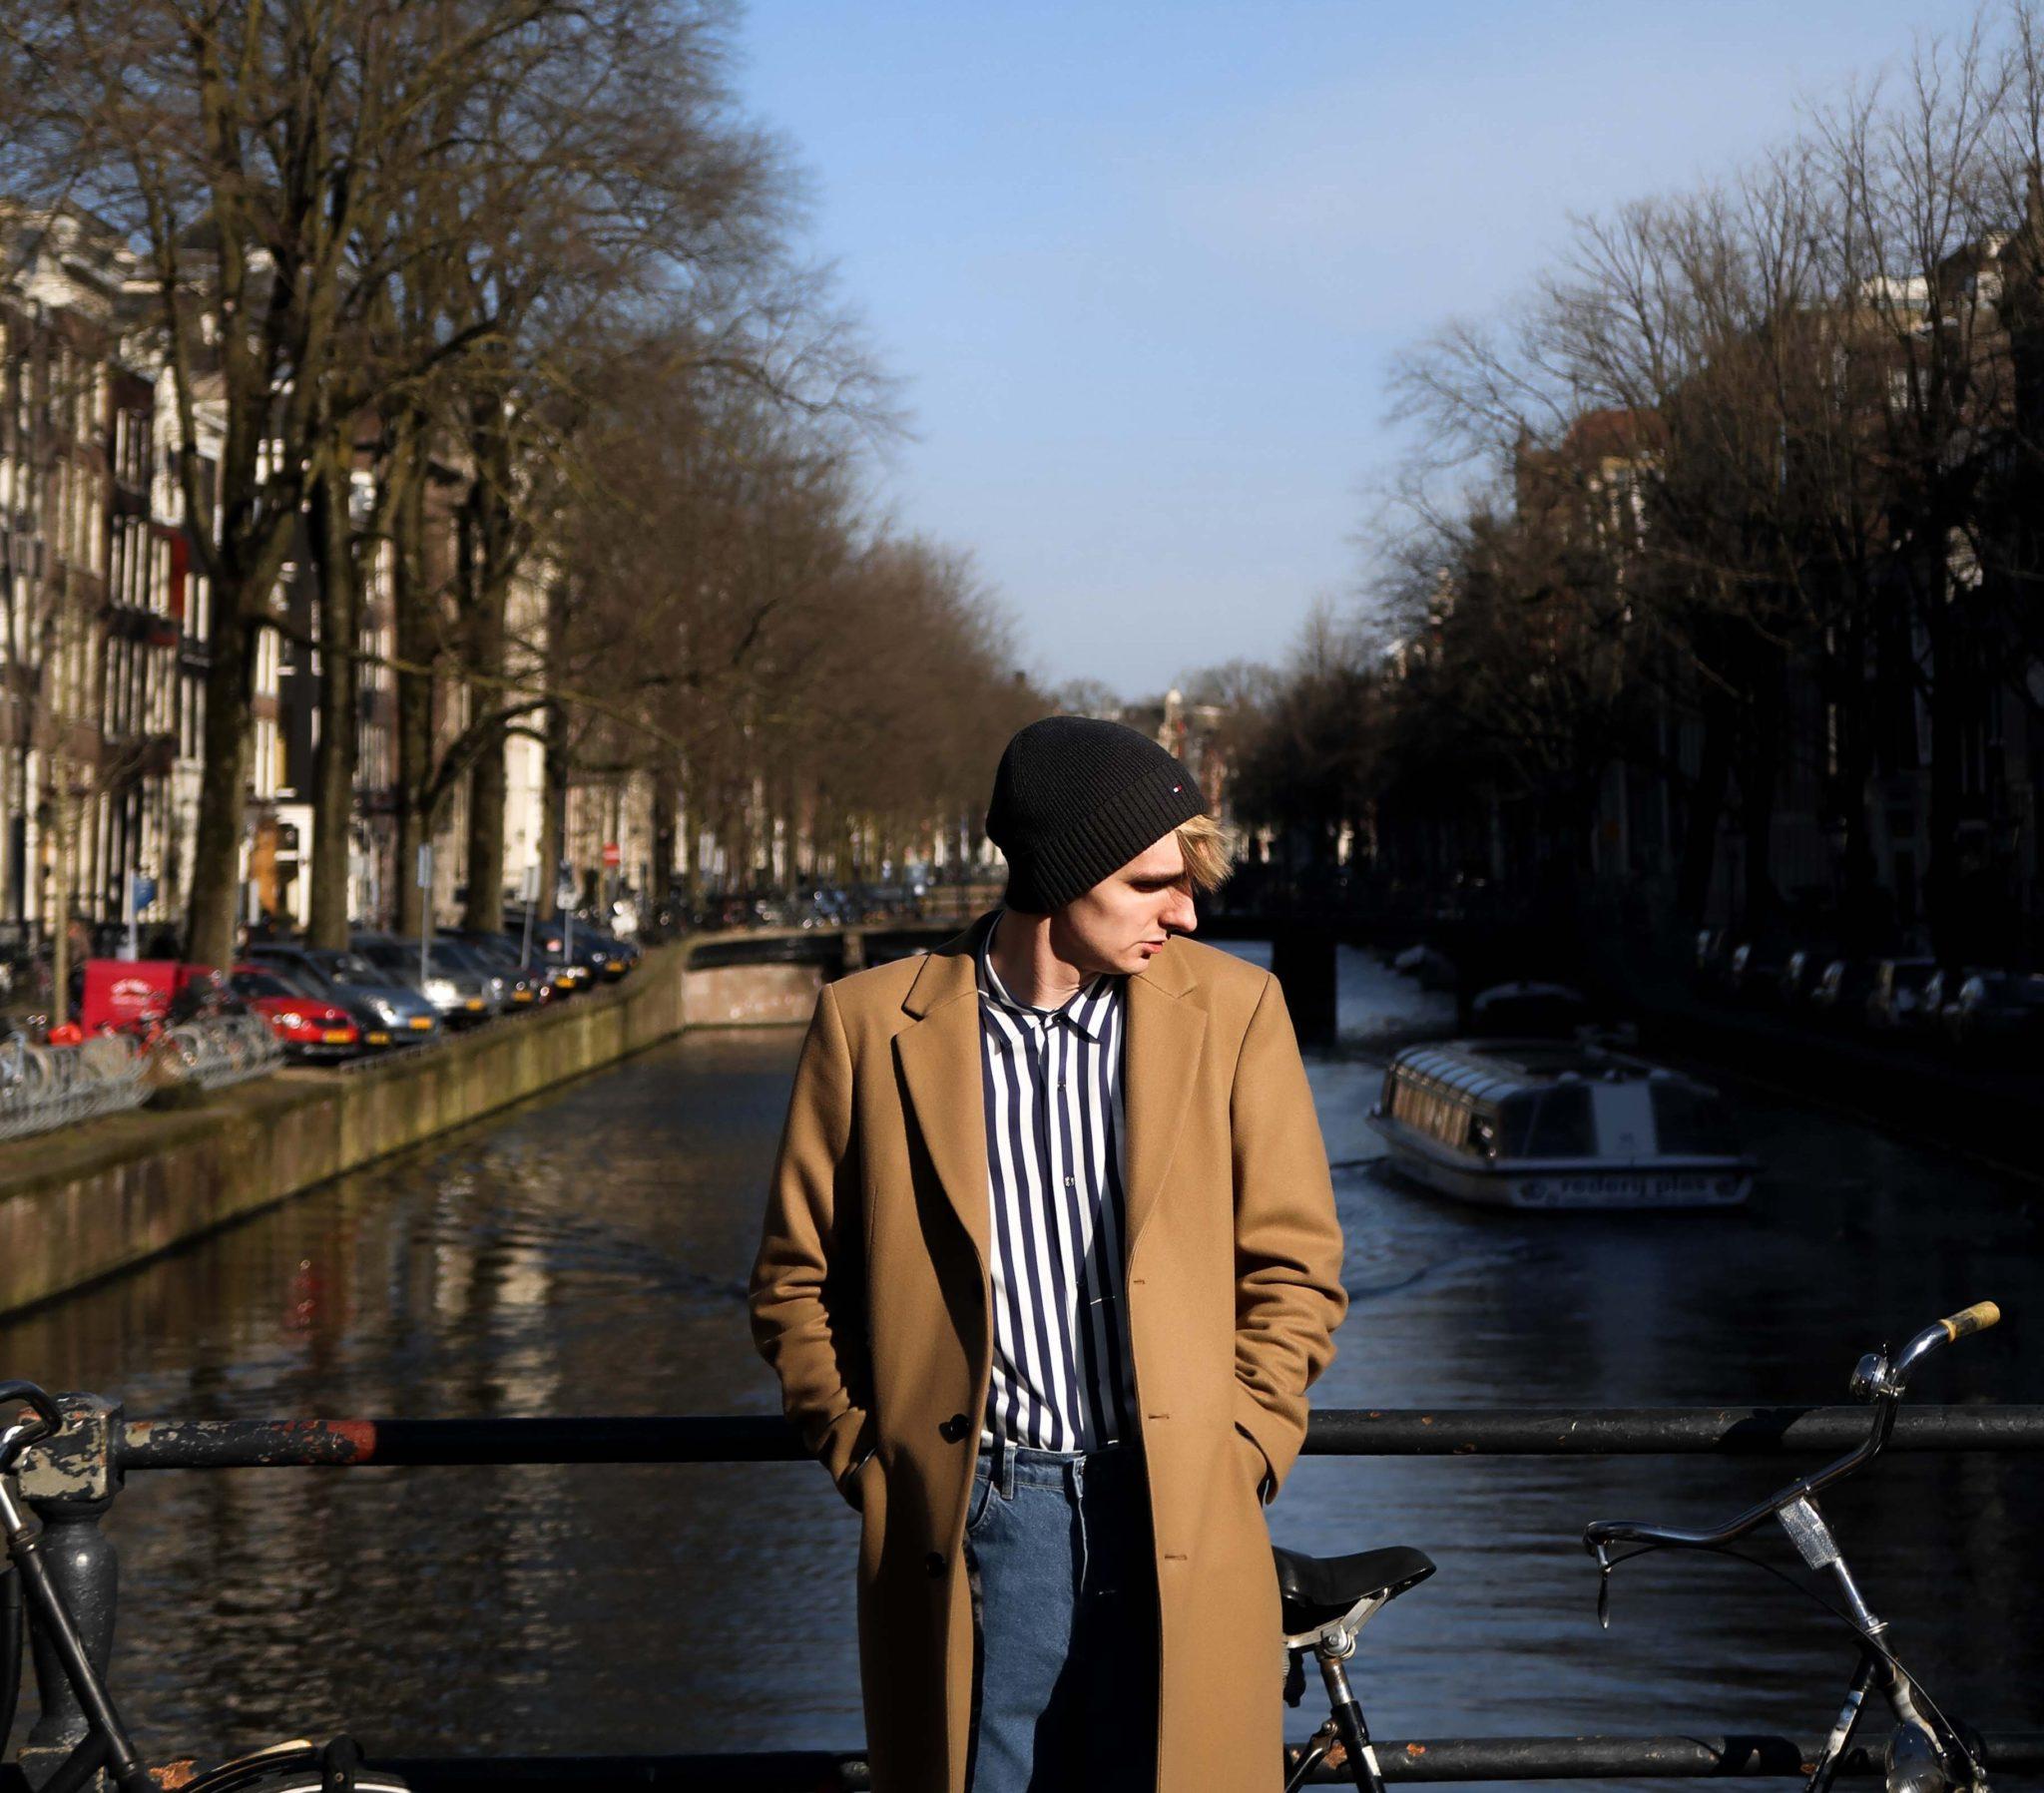 Mes adresses à Amsterdam